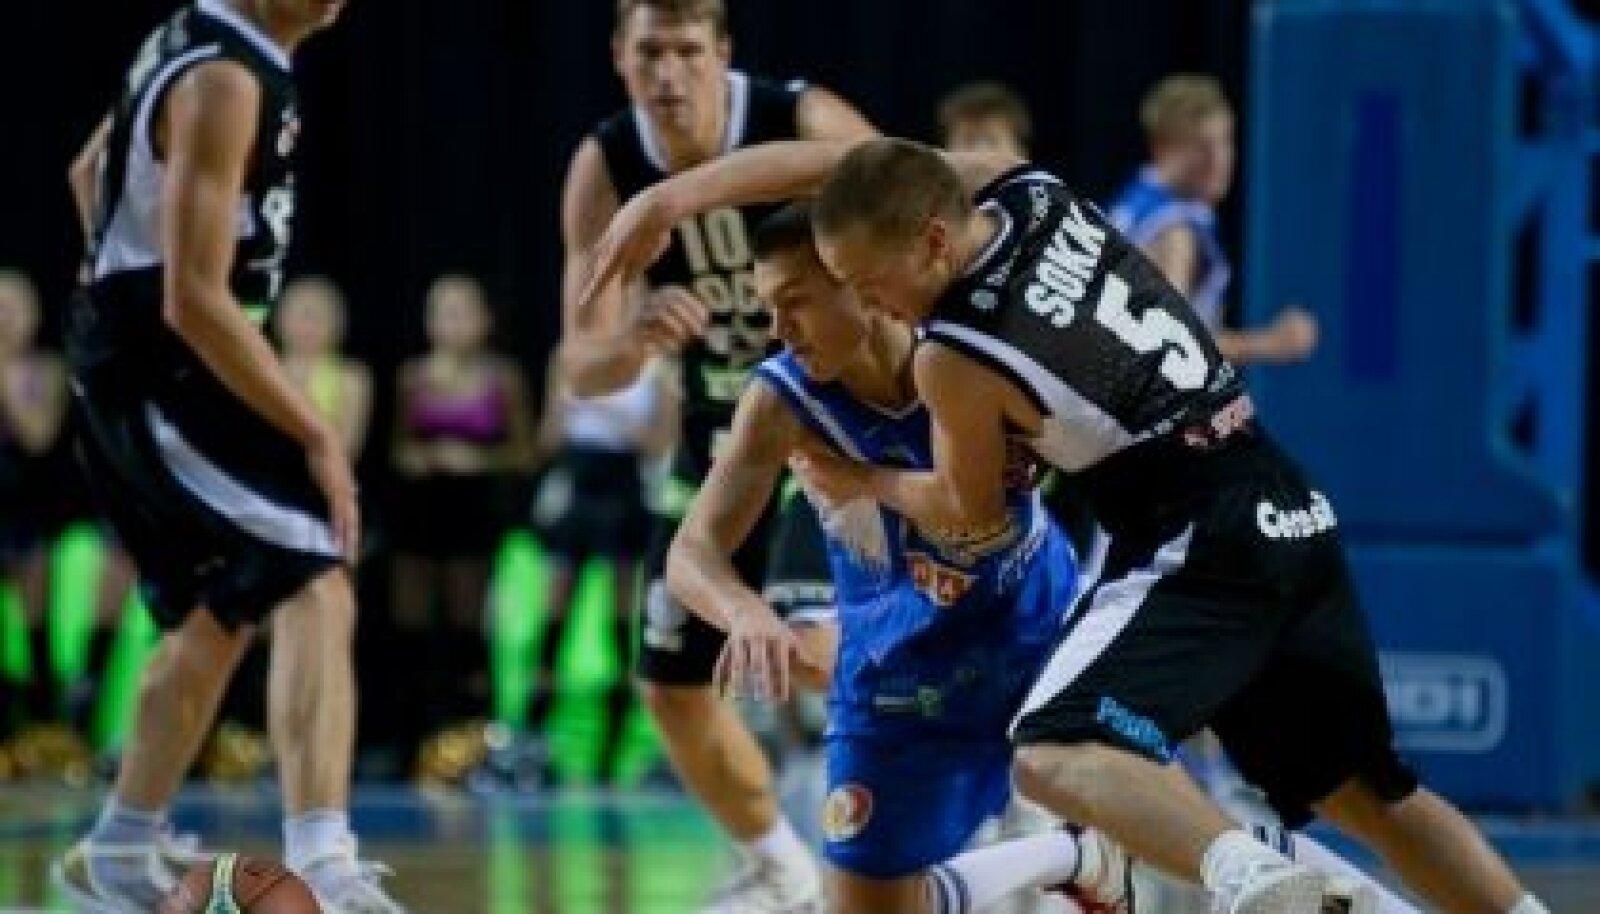 BC Kalev Cramo vs TÜ Rock